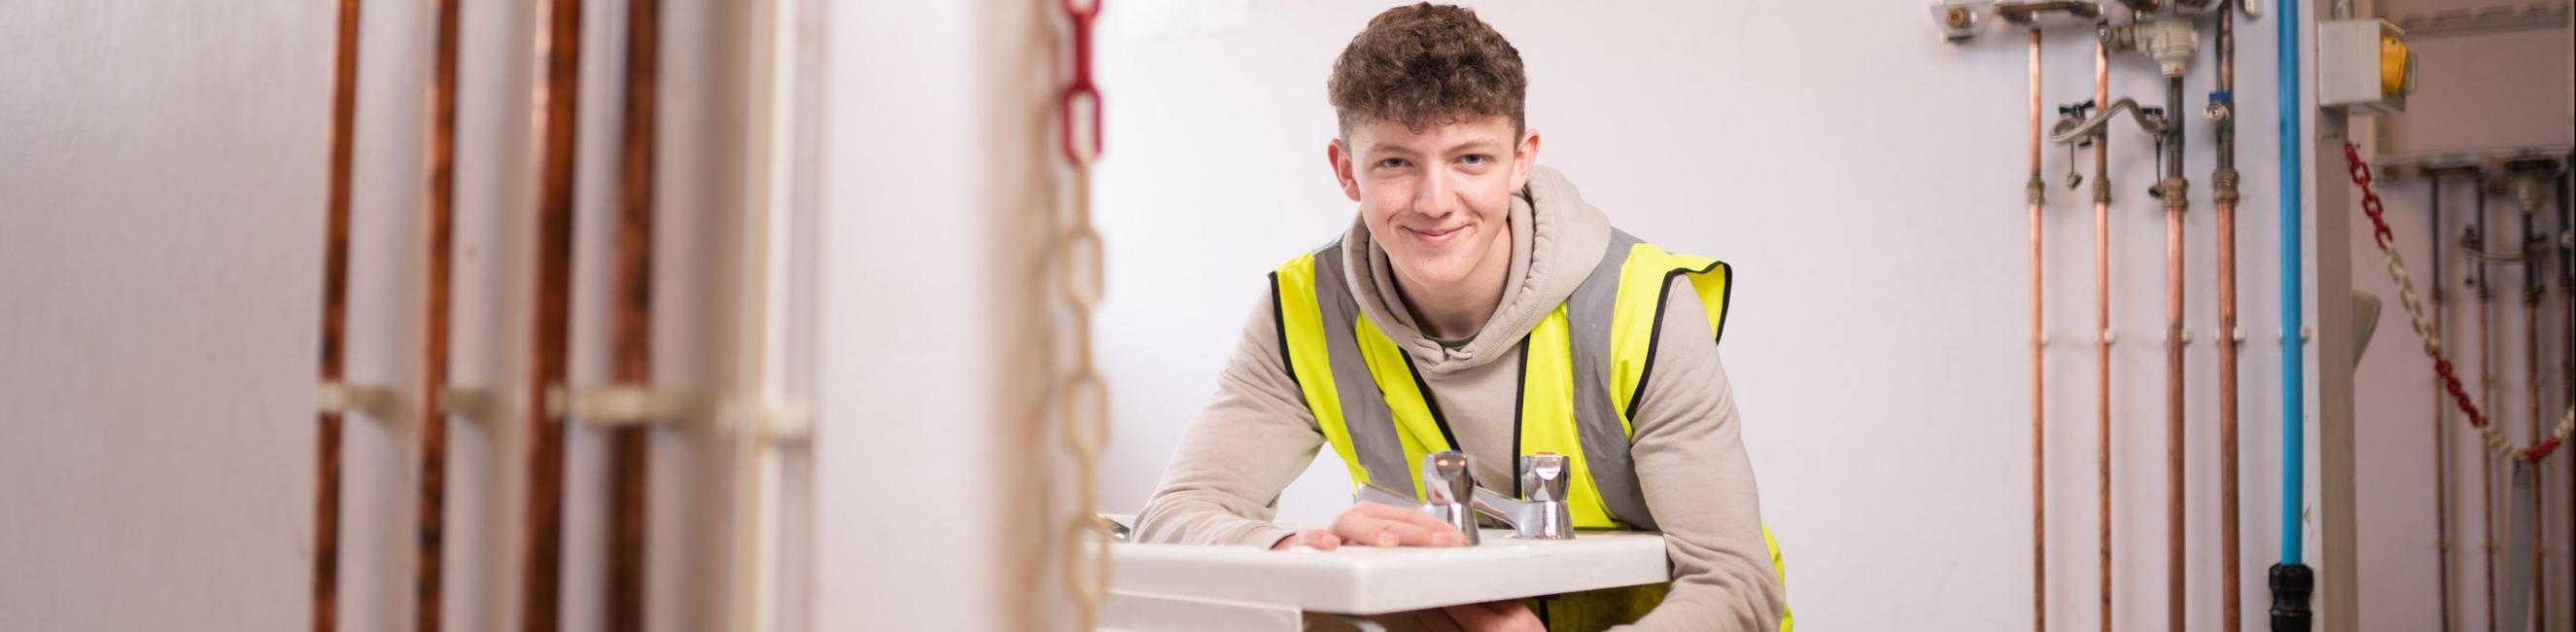 Plumbing Studies, Diploma | Weston College